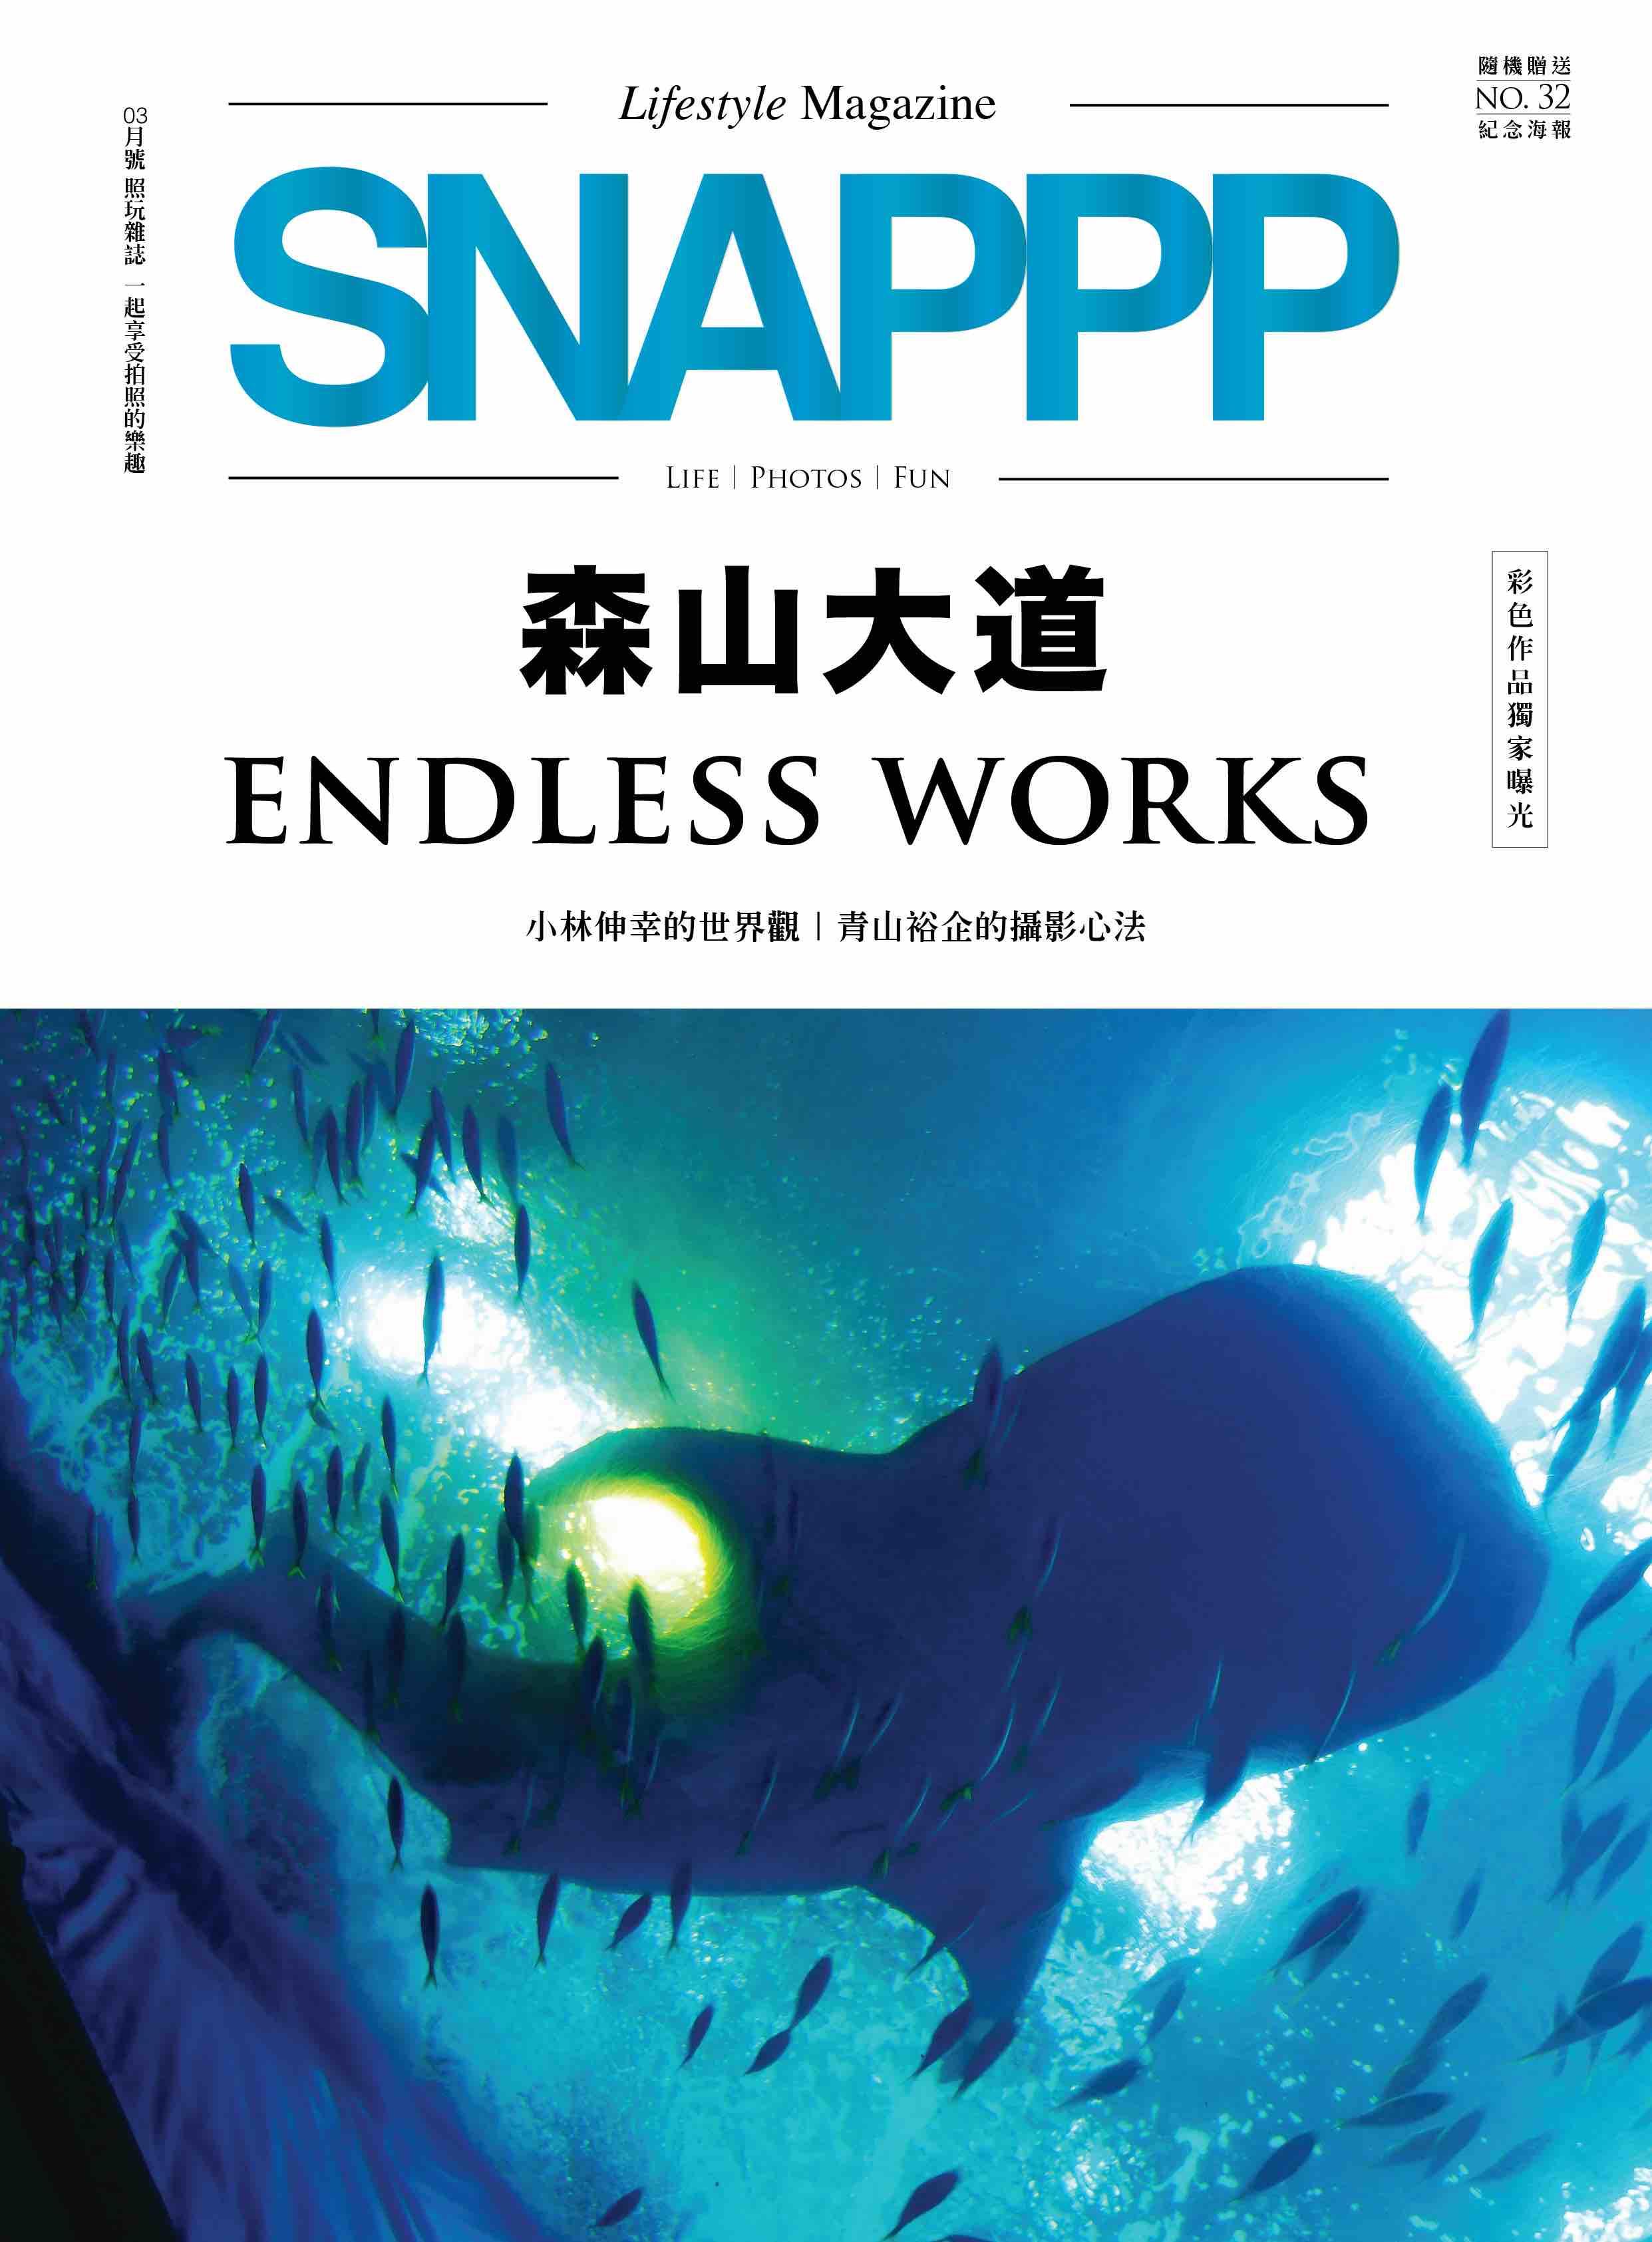 SNAPPP-NO32 COVER-ver2.jpg